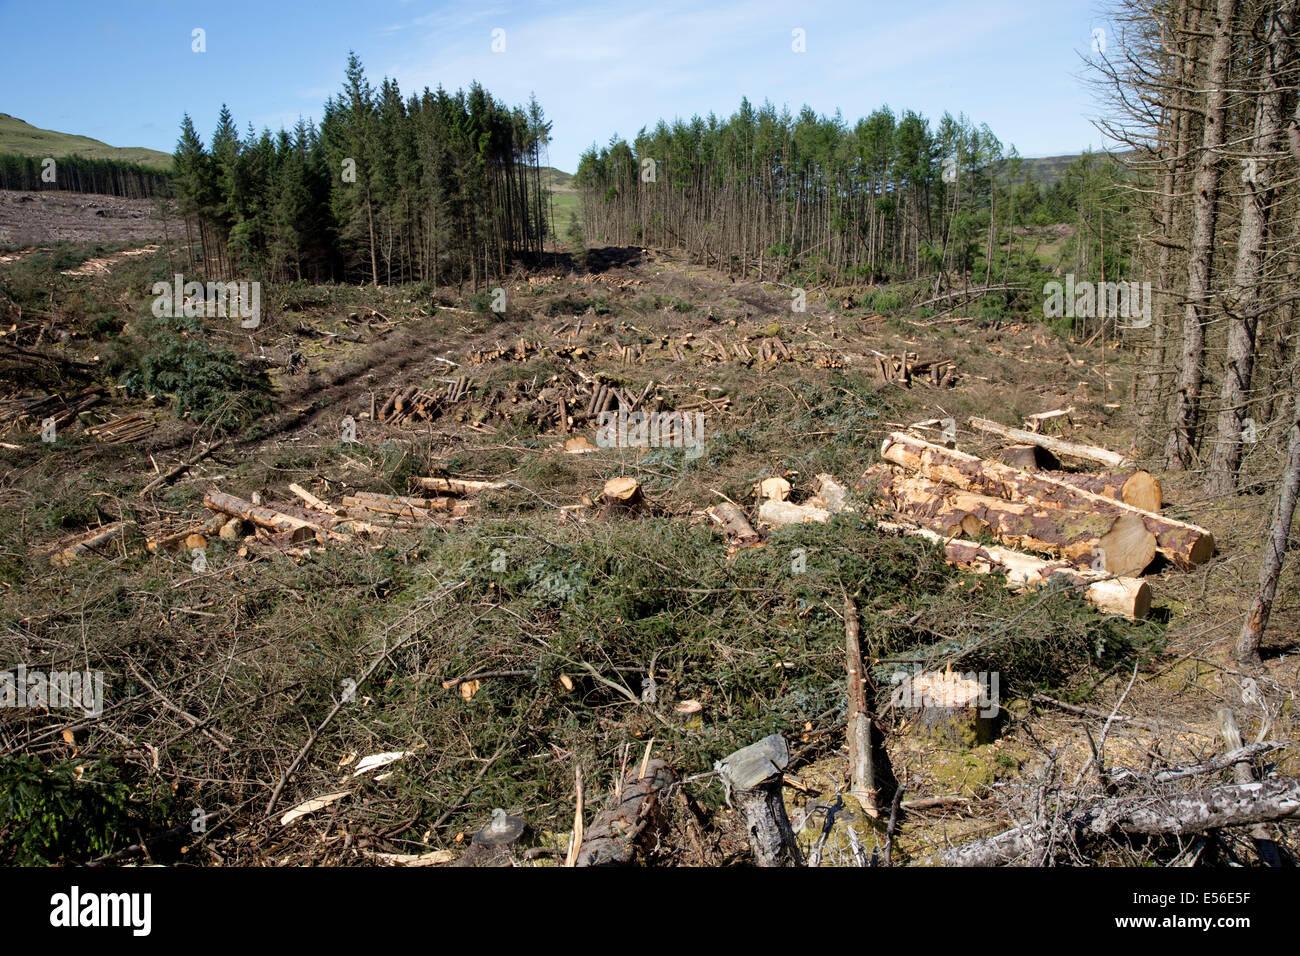 Harvesting pine trees North West Mull Community woodland Isle of Mull Scotland - Stock Image